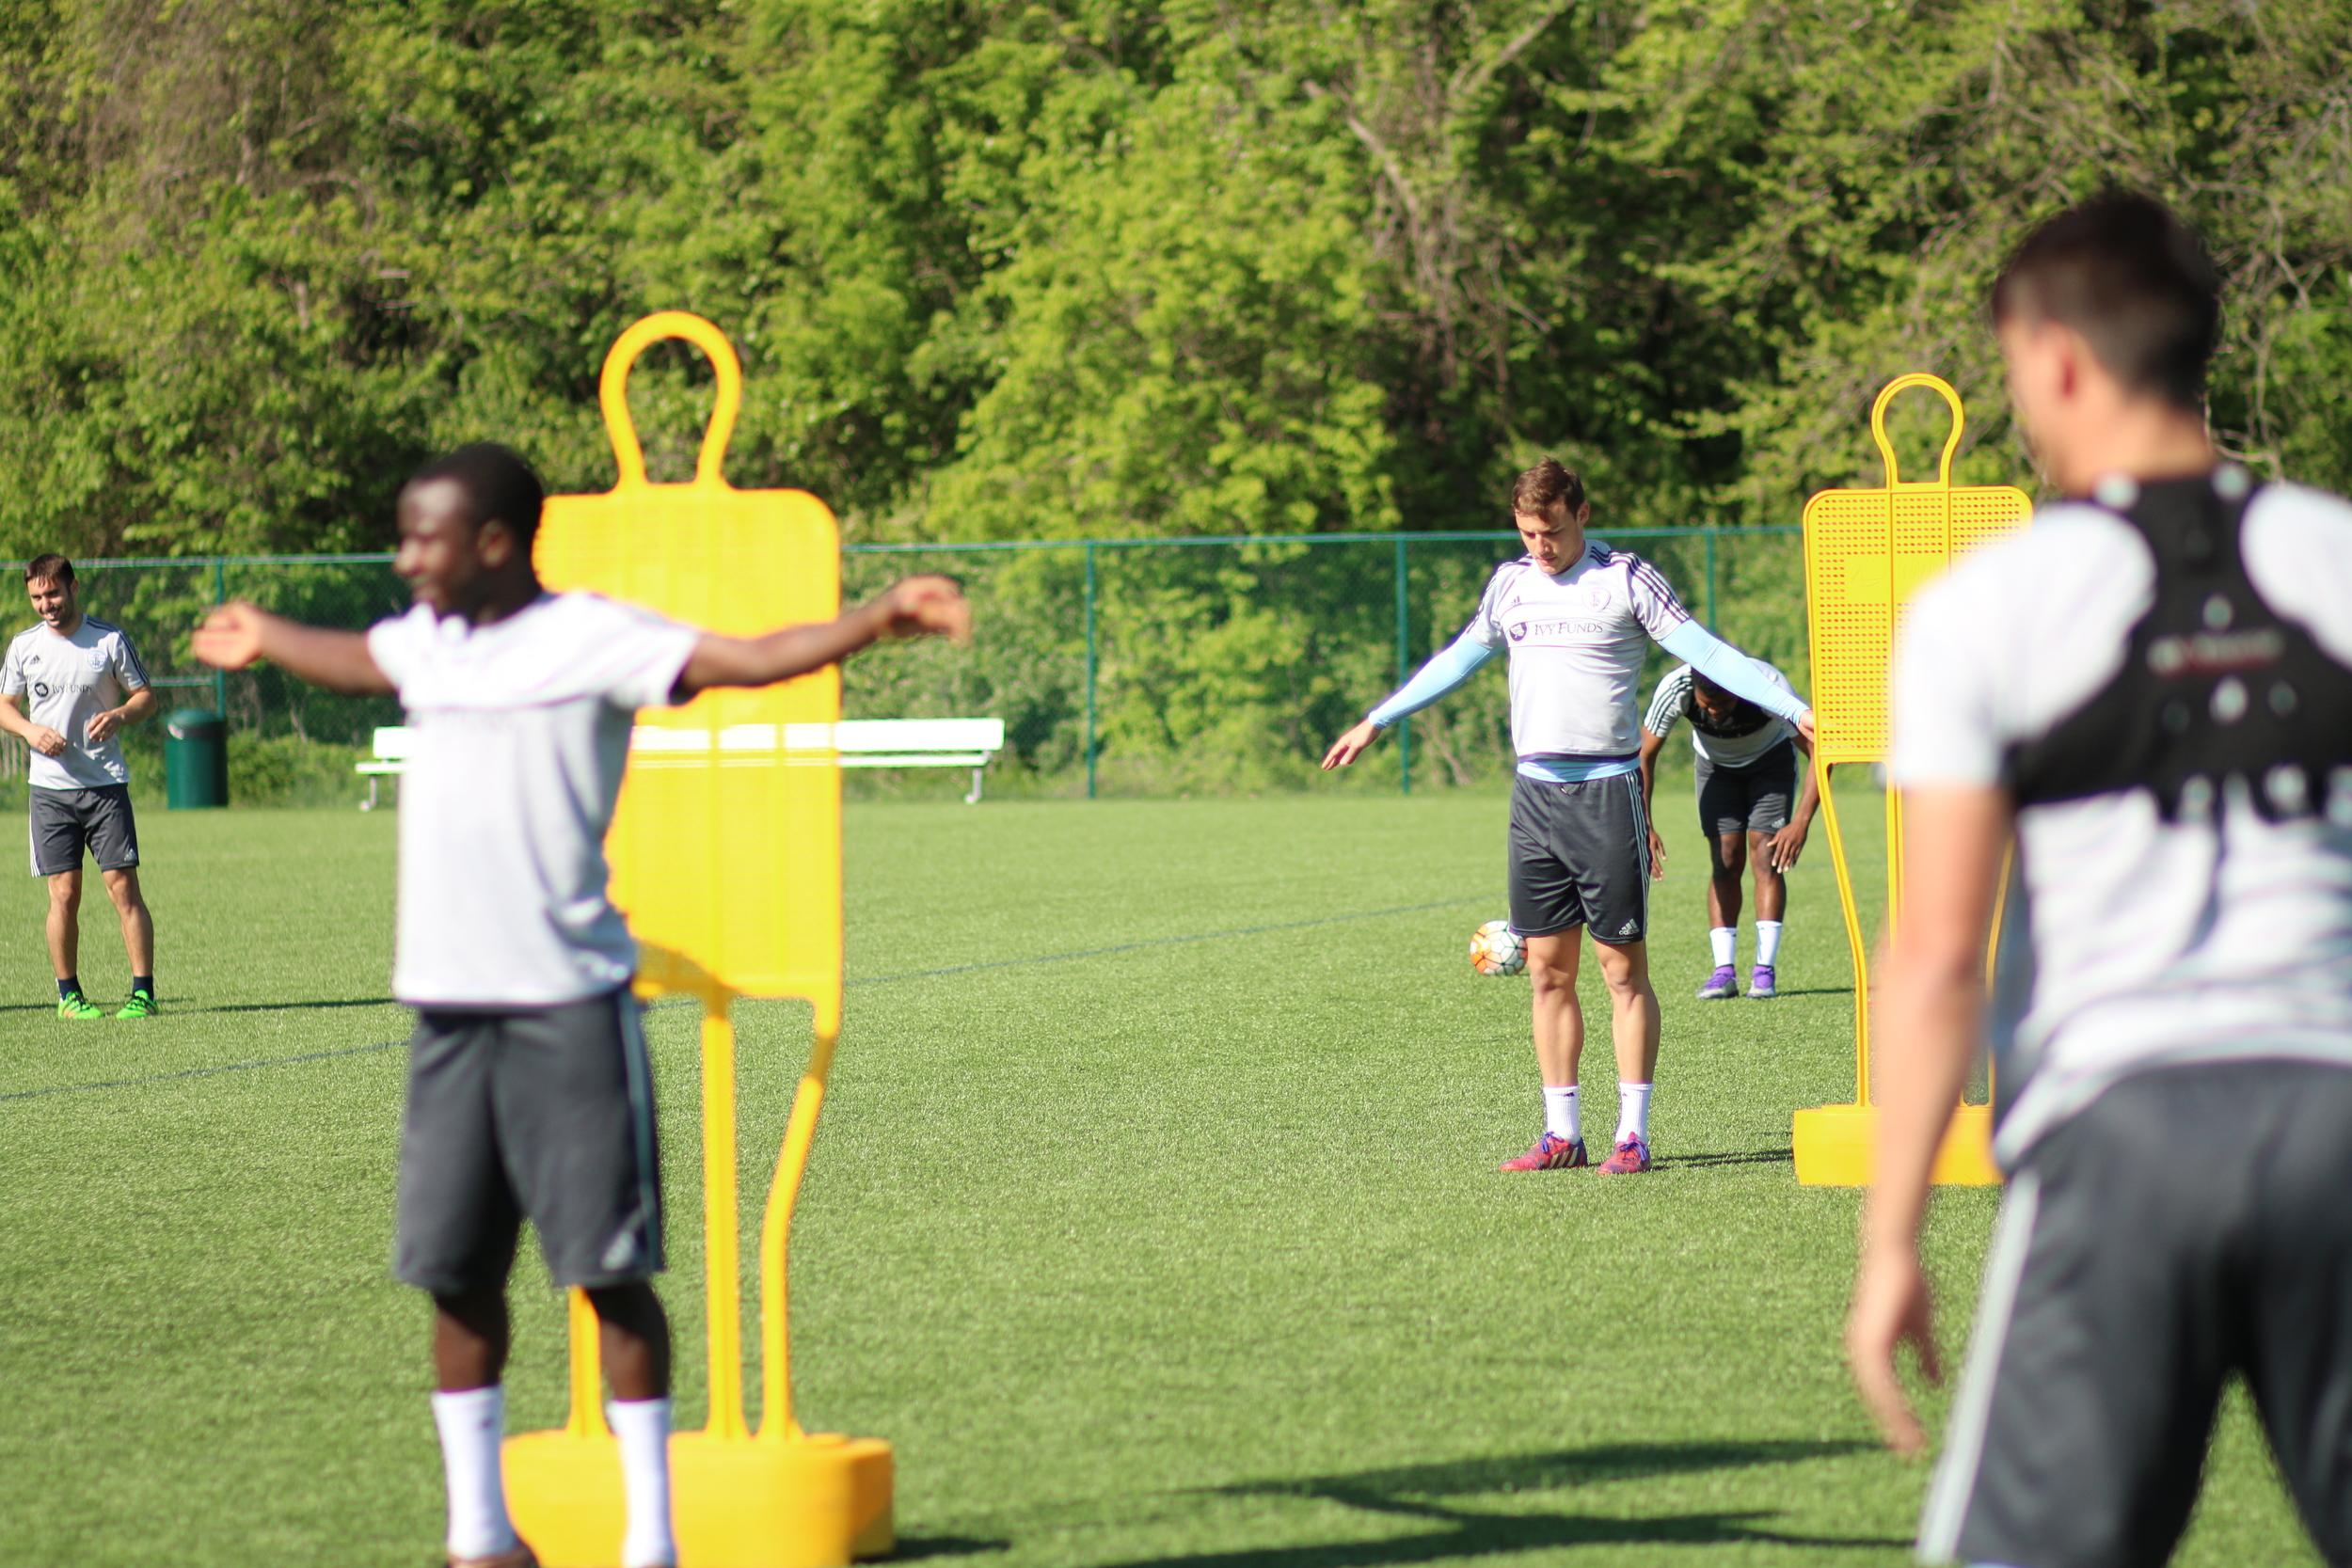 Training_0101.JPG